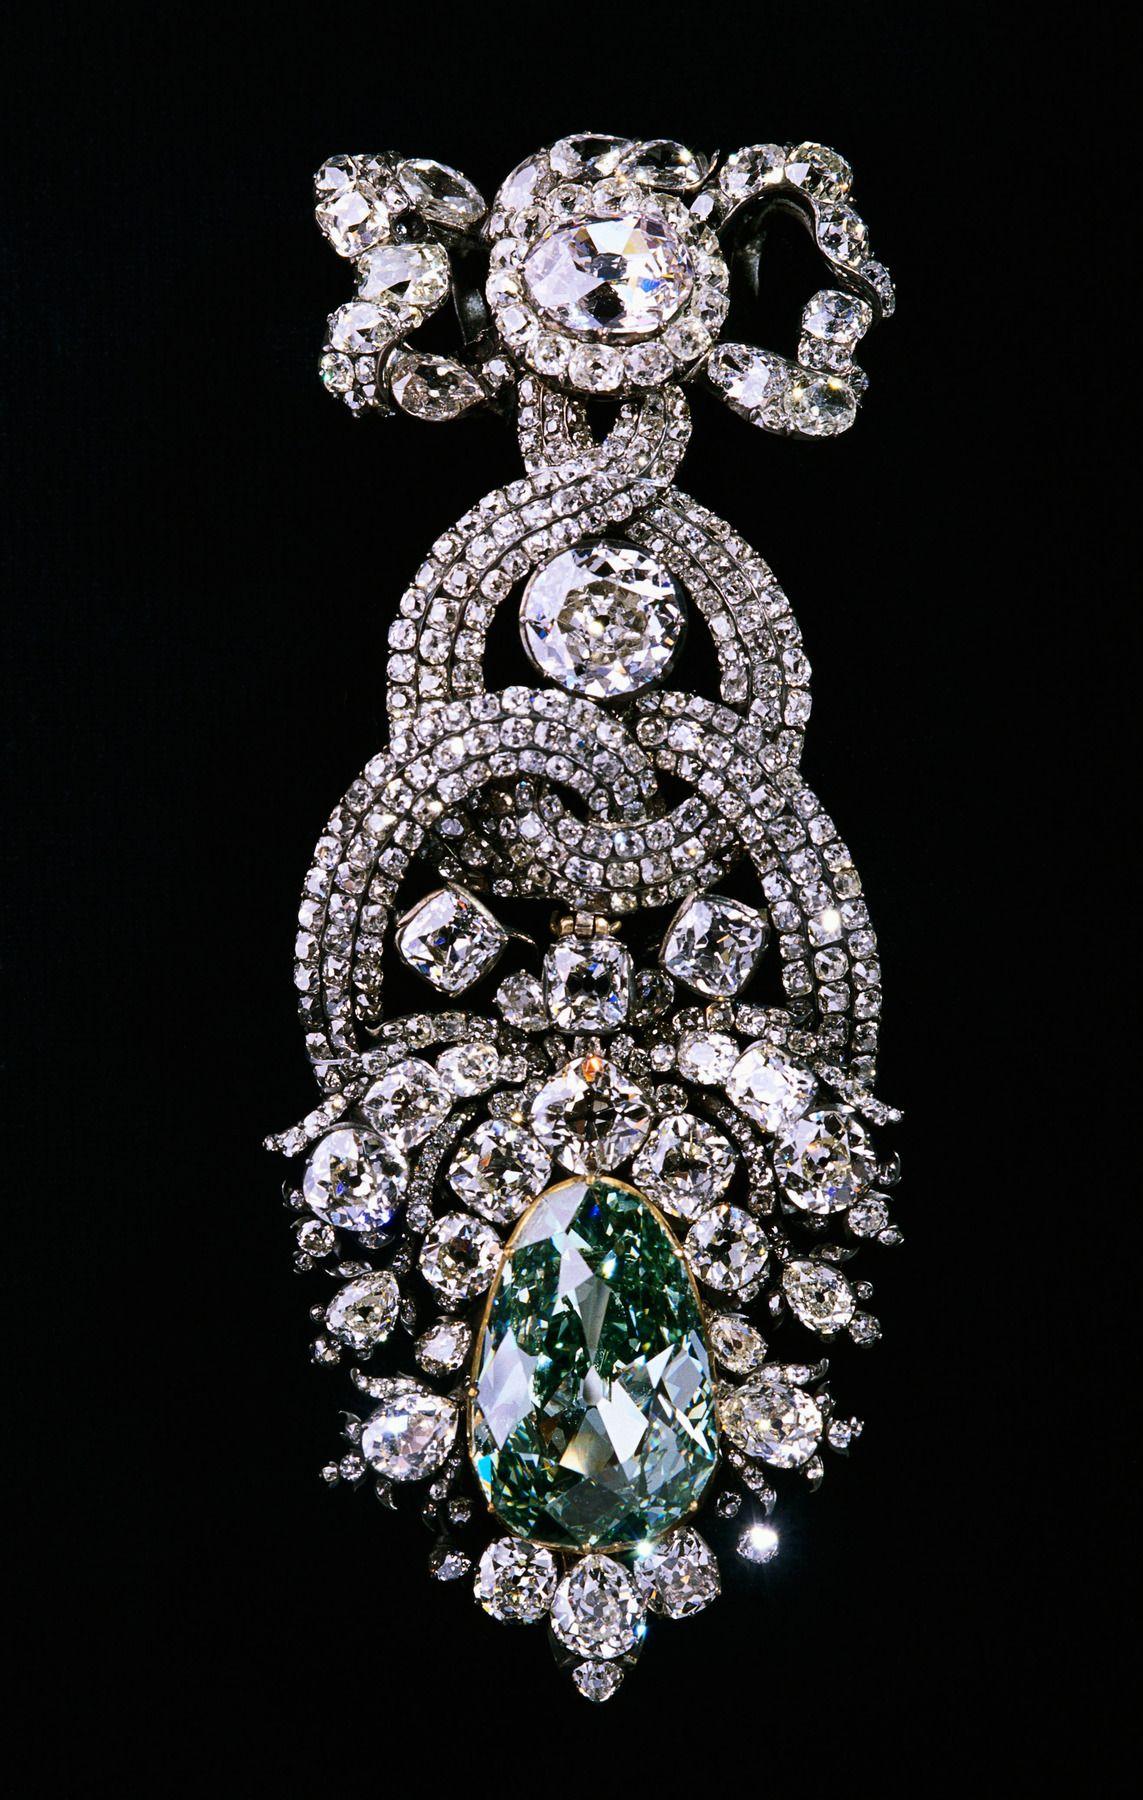 Pin By Jeff Steen On Beautiful Sparklies Diamond Green Diamond Beautiful Jewelry